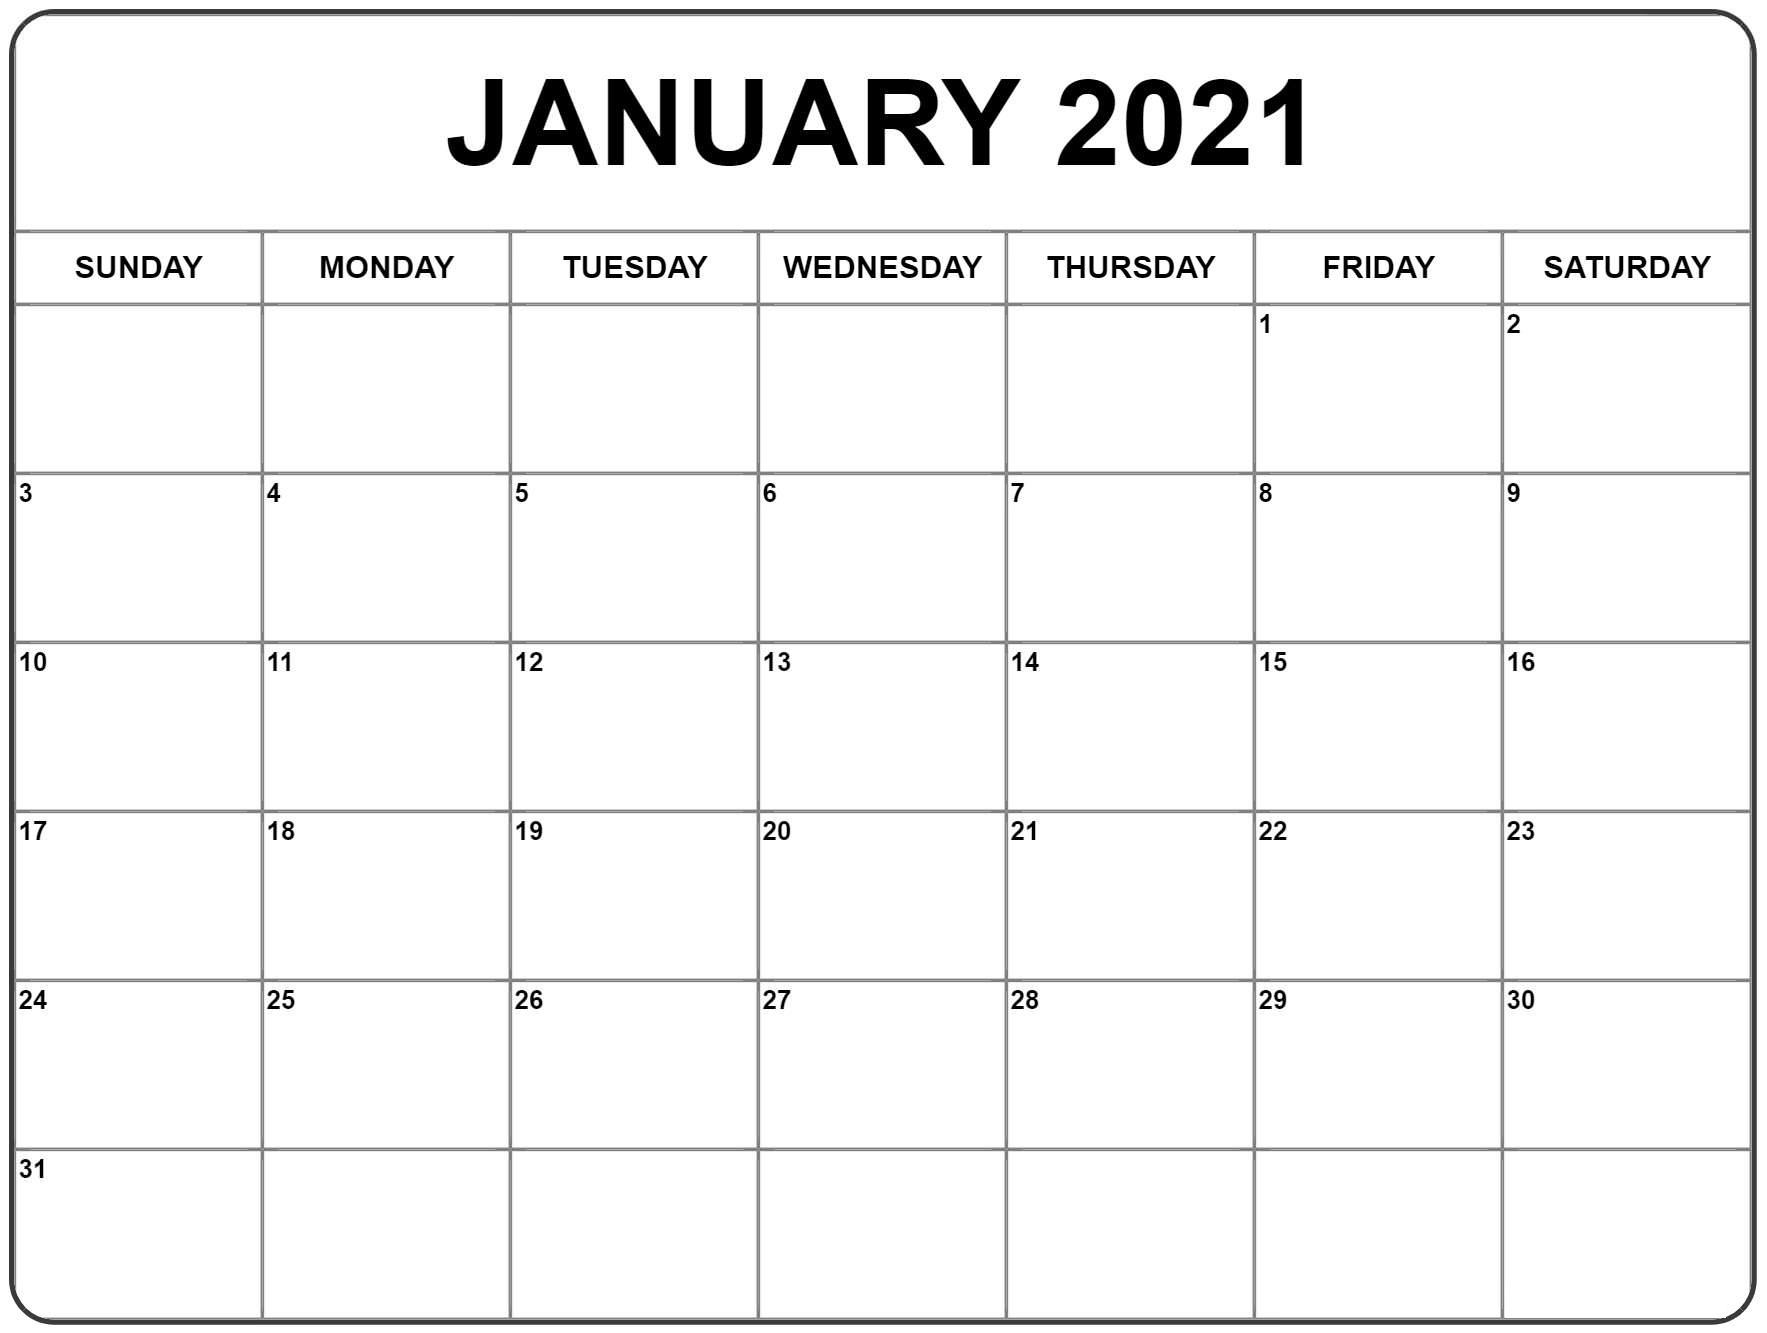 Free January 2021 Calendar Printable Blank Templates Regarding Printable Sunrise And Sunset Calander 2021